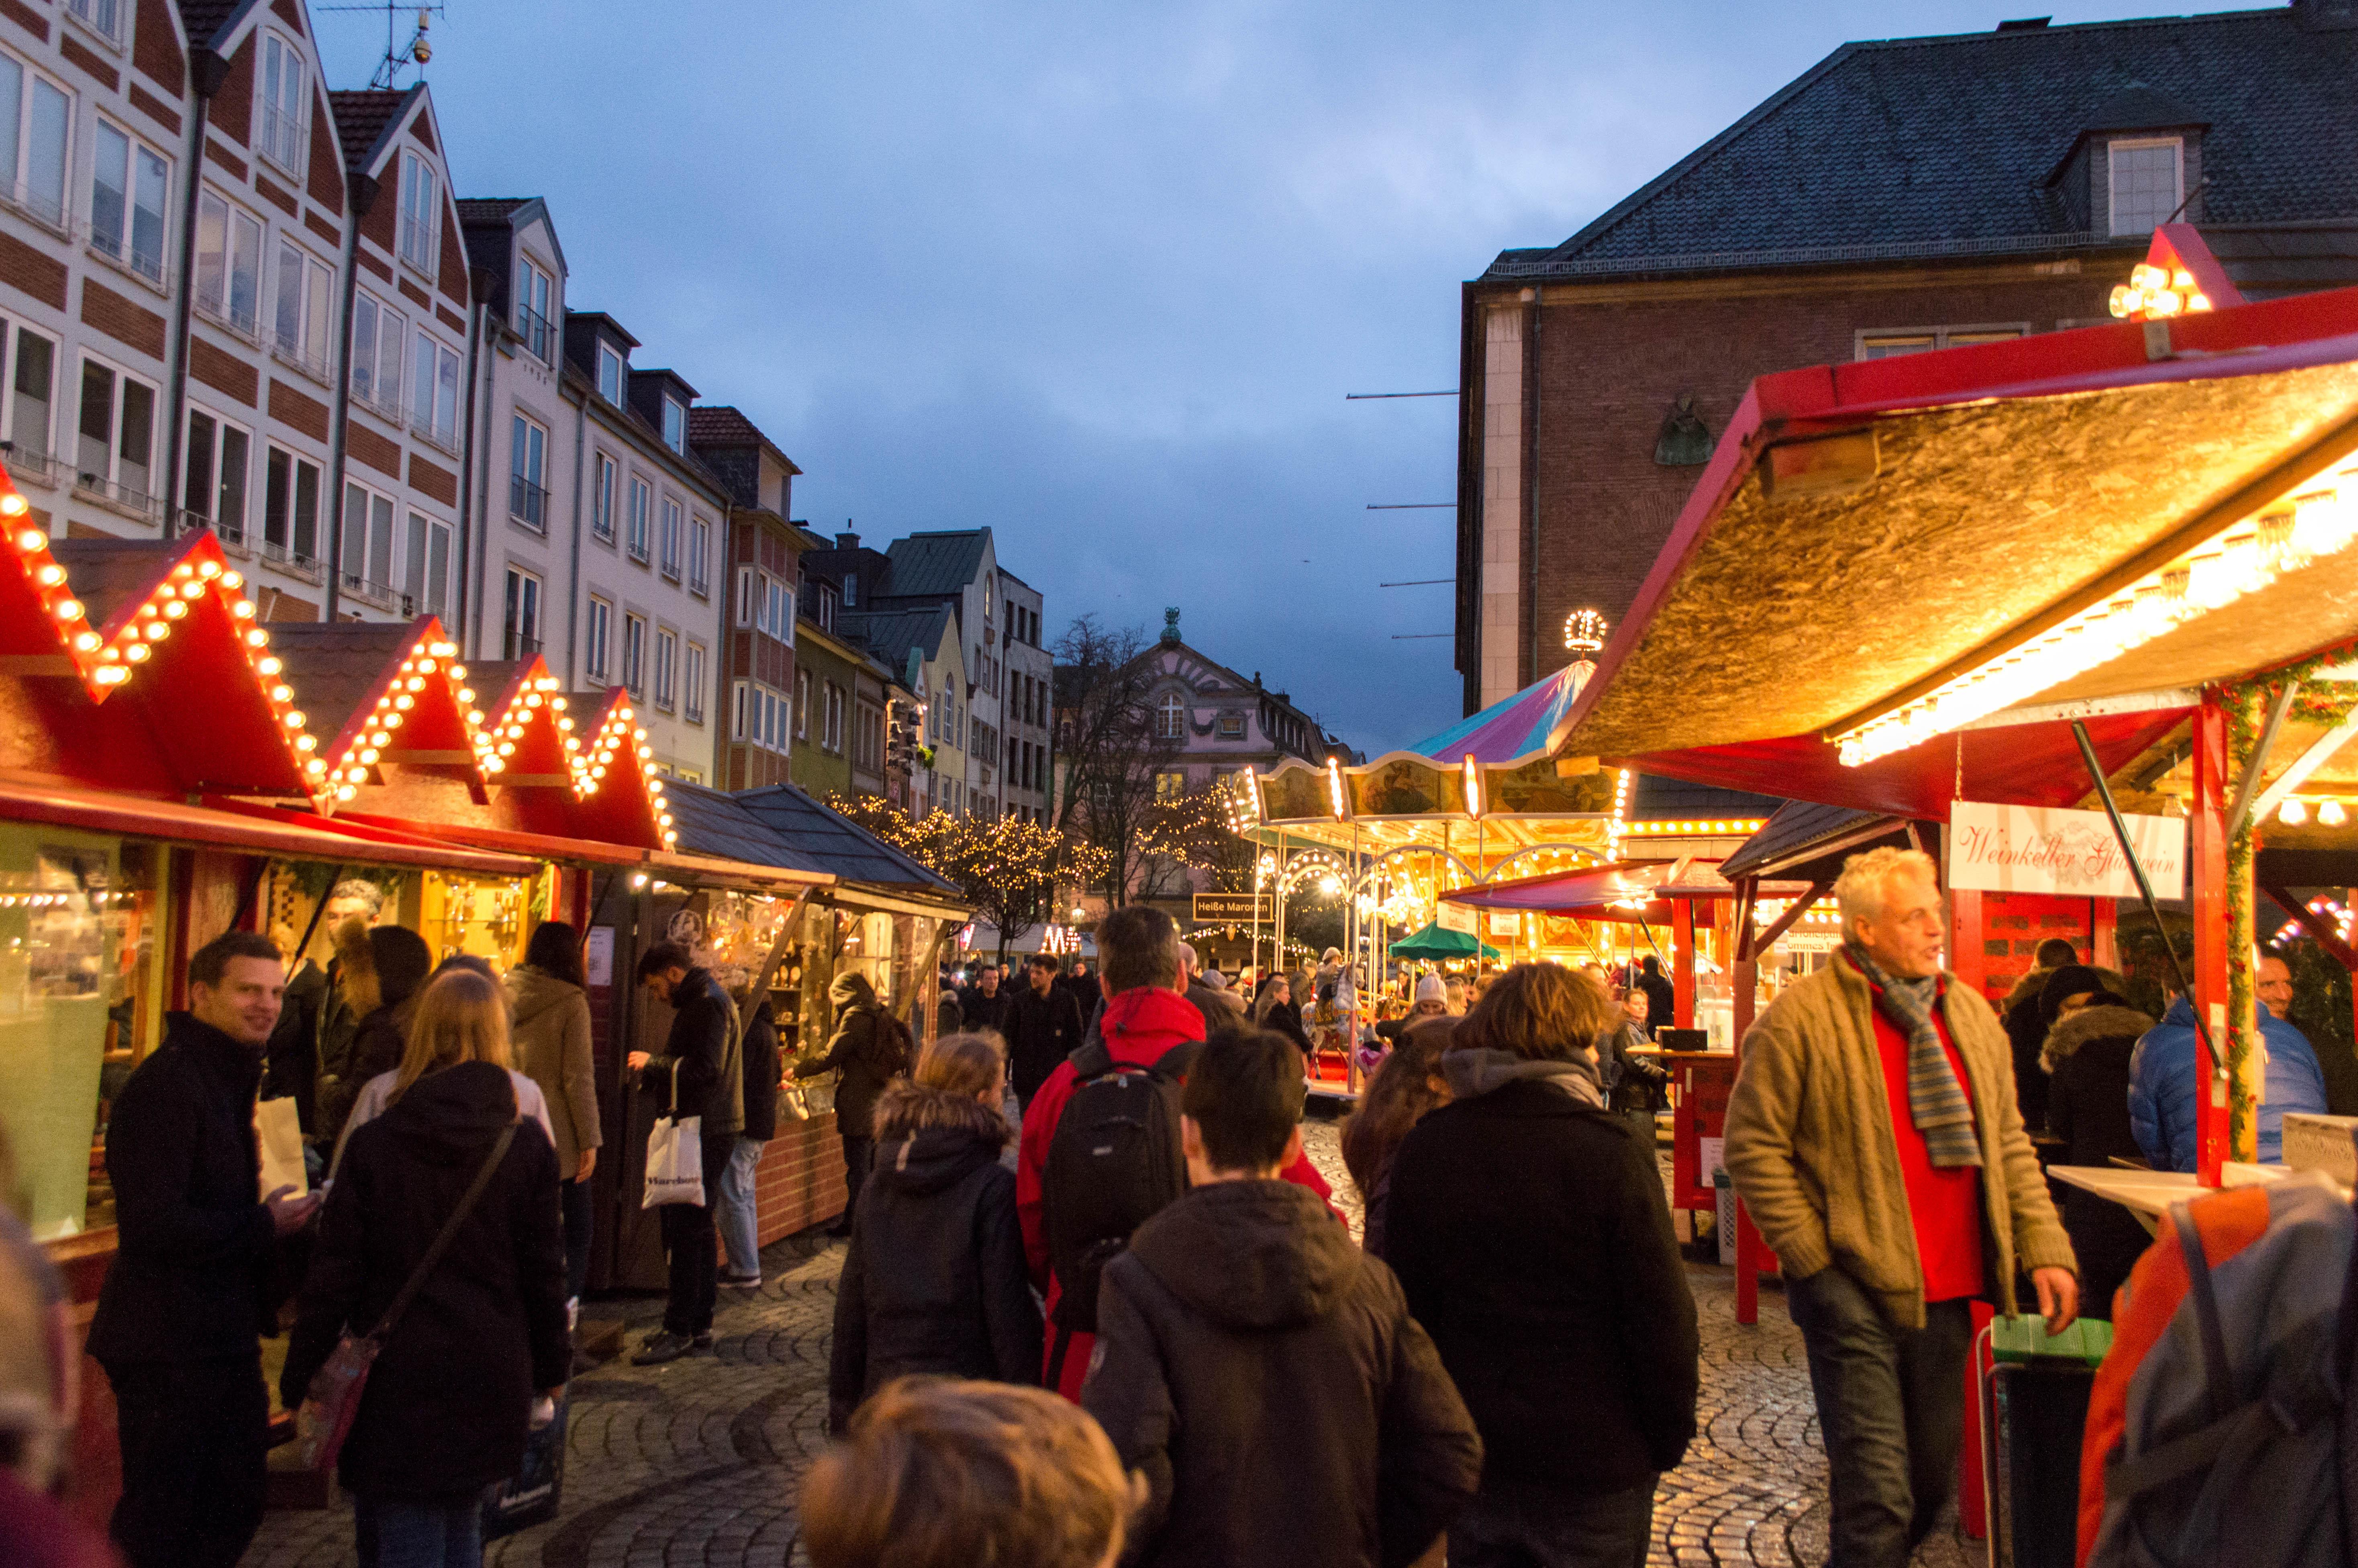 File:Düsseldorf christmas market at Marktplatz.jpg - Wikimedia Commons